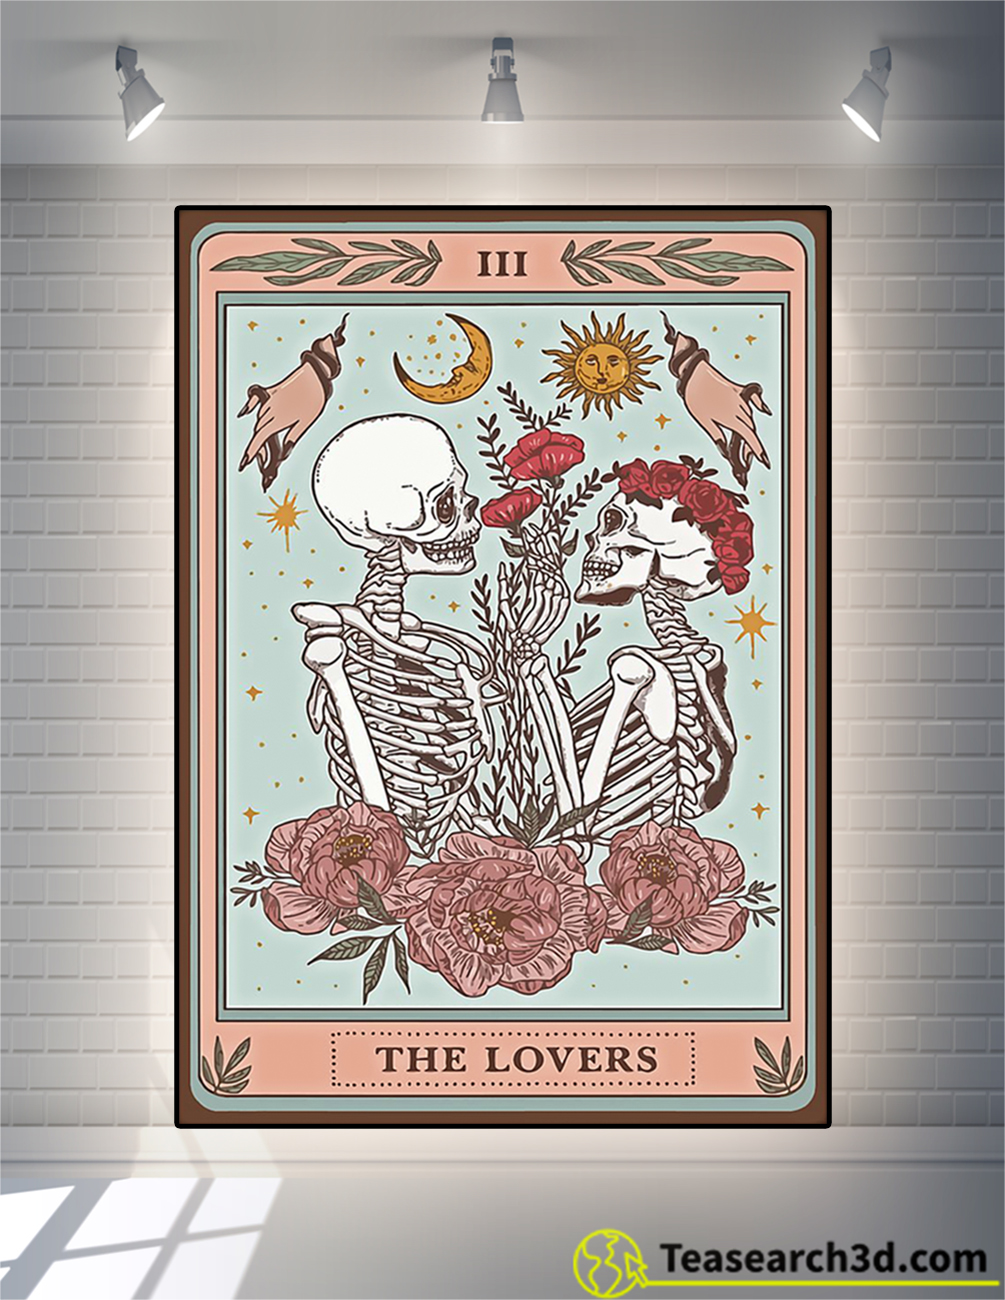 Skeleton tarot card the lovers poster